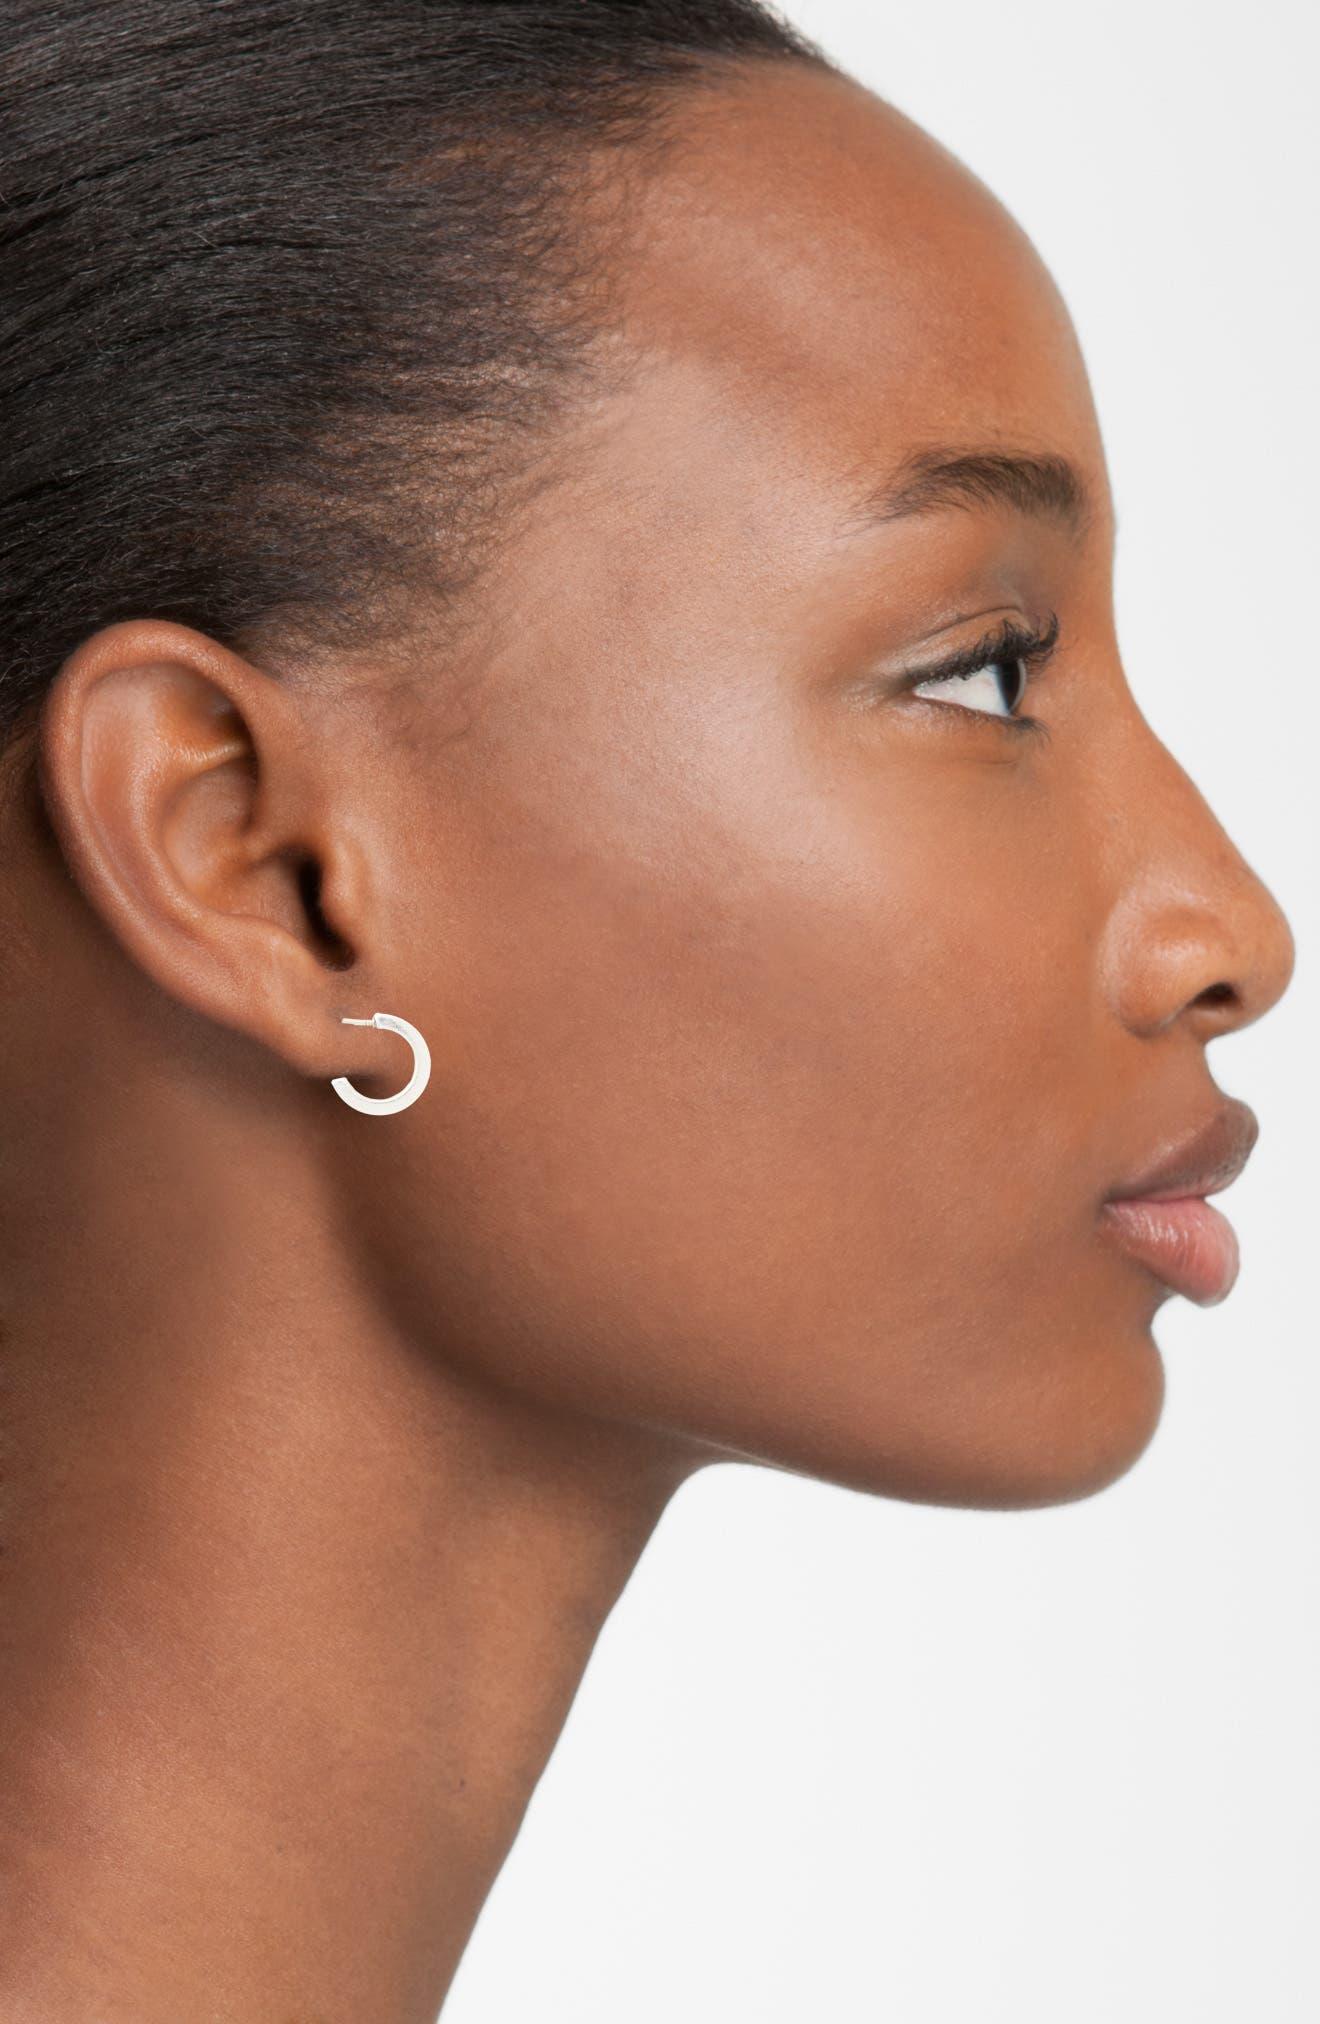 MADEWELL, Set of 3 Mini Hoop Earrings, Alternate thumbnail 2, color, MIXED METAL